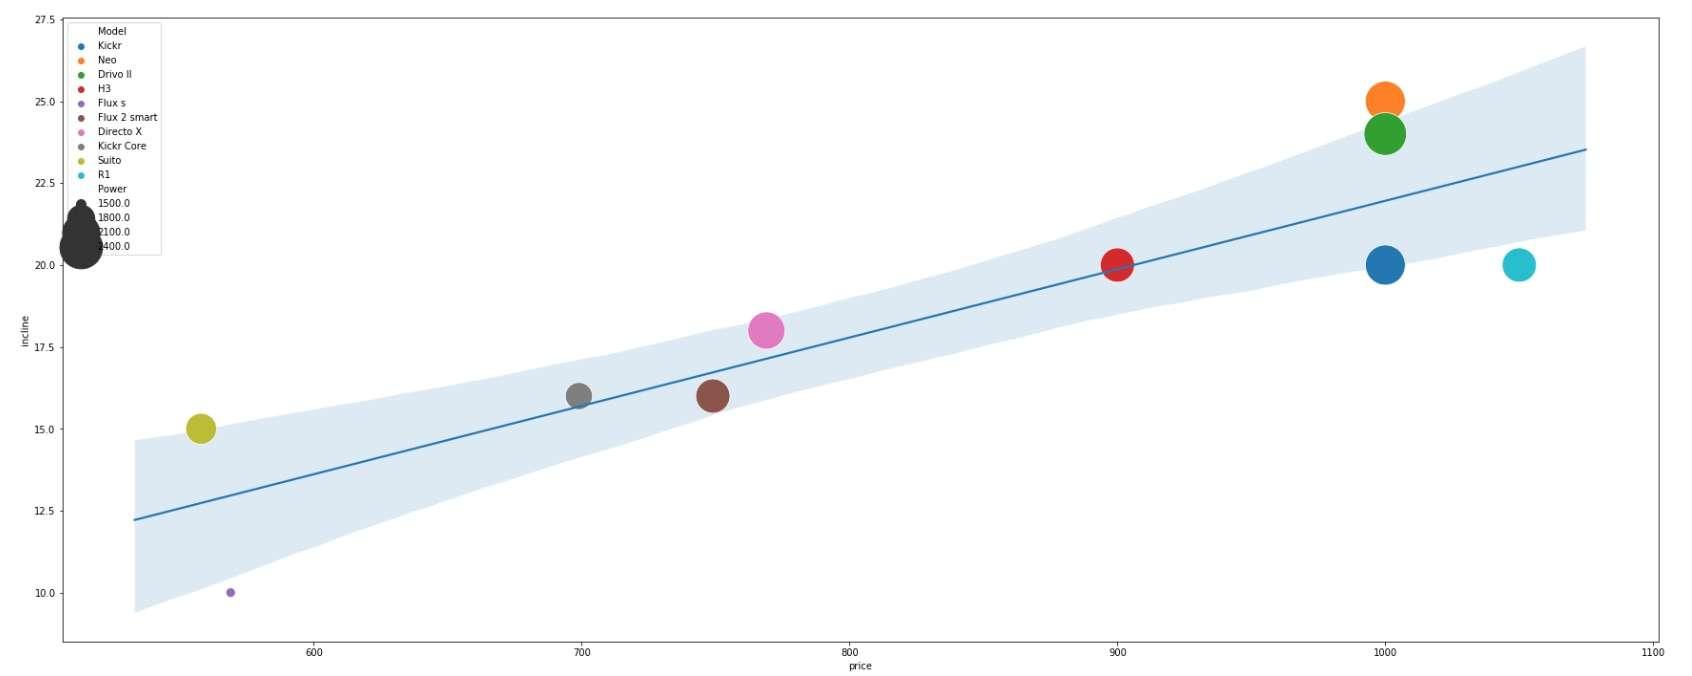 smart-trainer-incline-comparison Saris Hammer H3 Review Overview